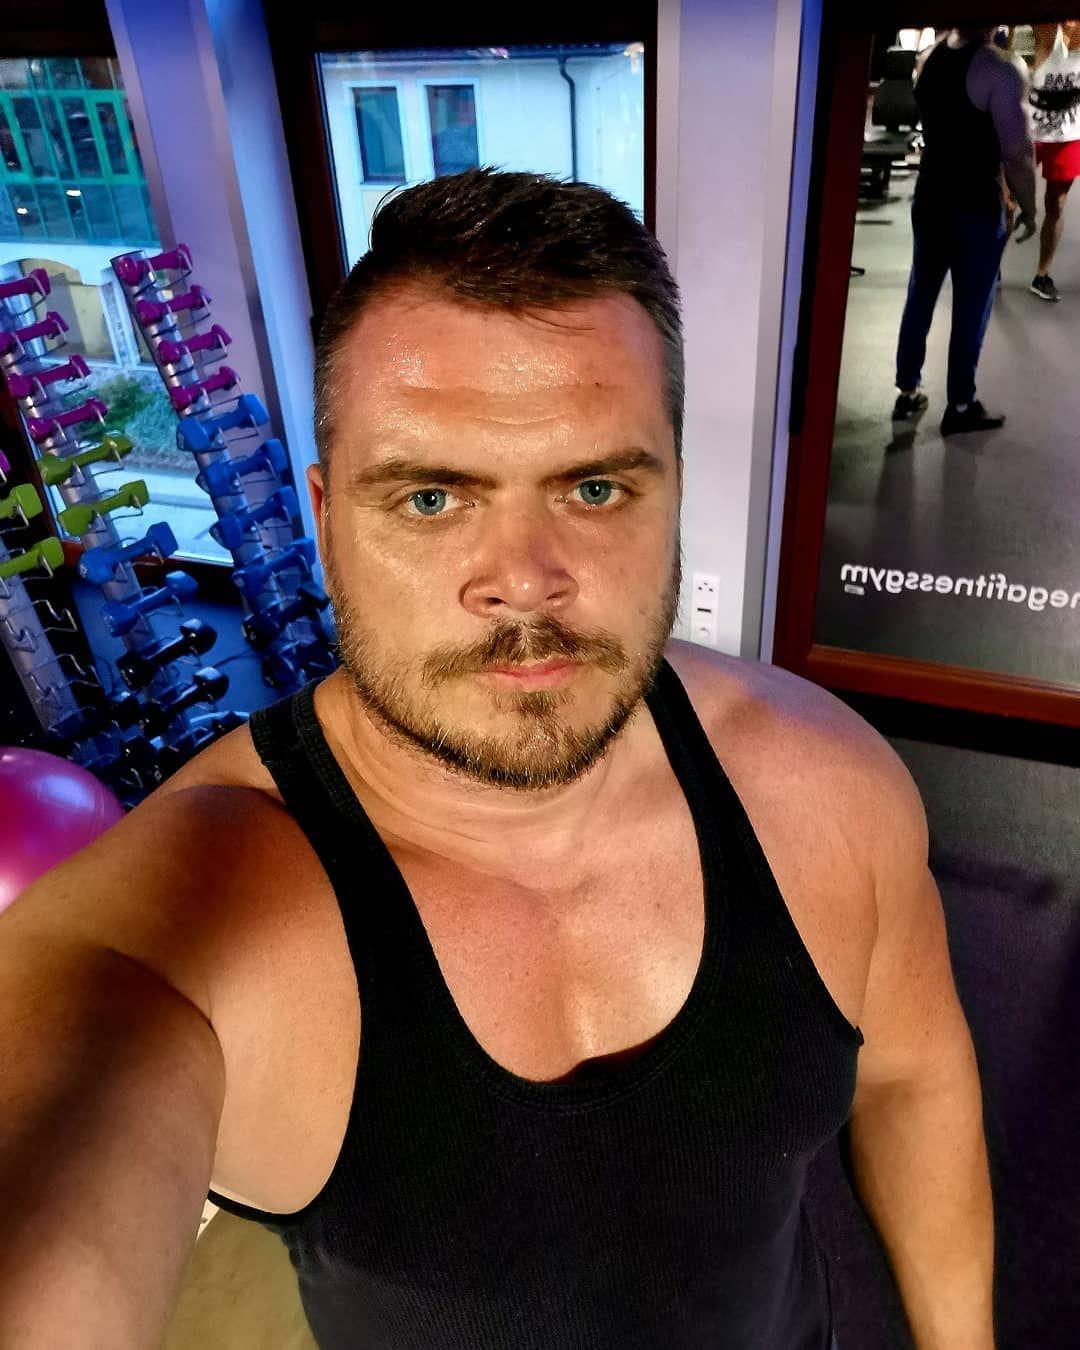 @izabell_vm #gym #fitness #fit #motivation #workout #bodybuilding #polishboy #training #poland #inst...